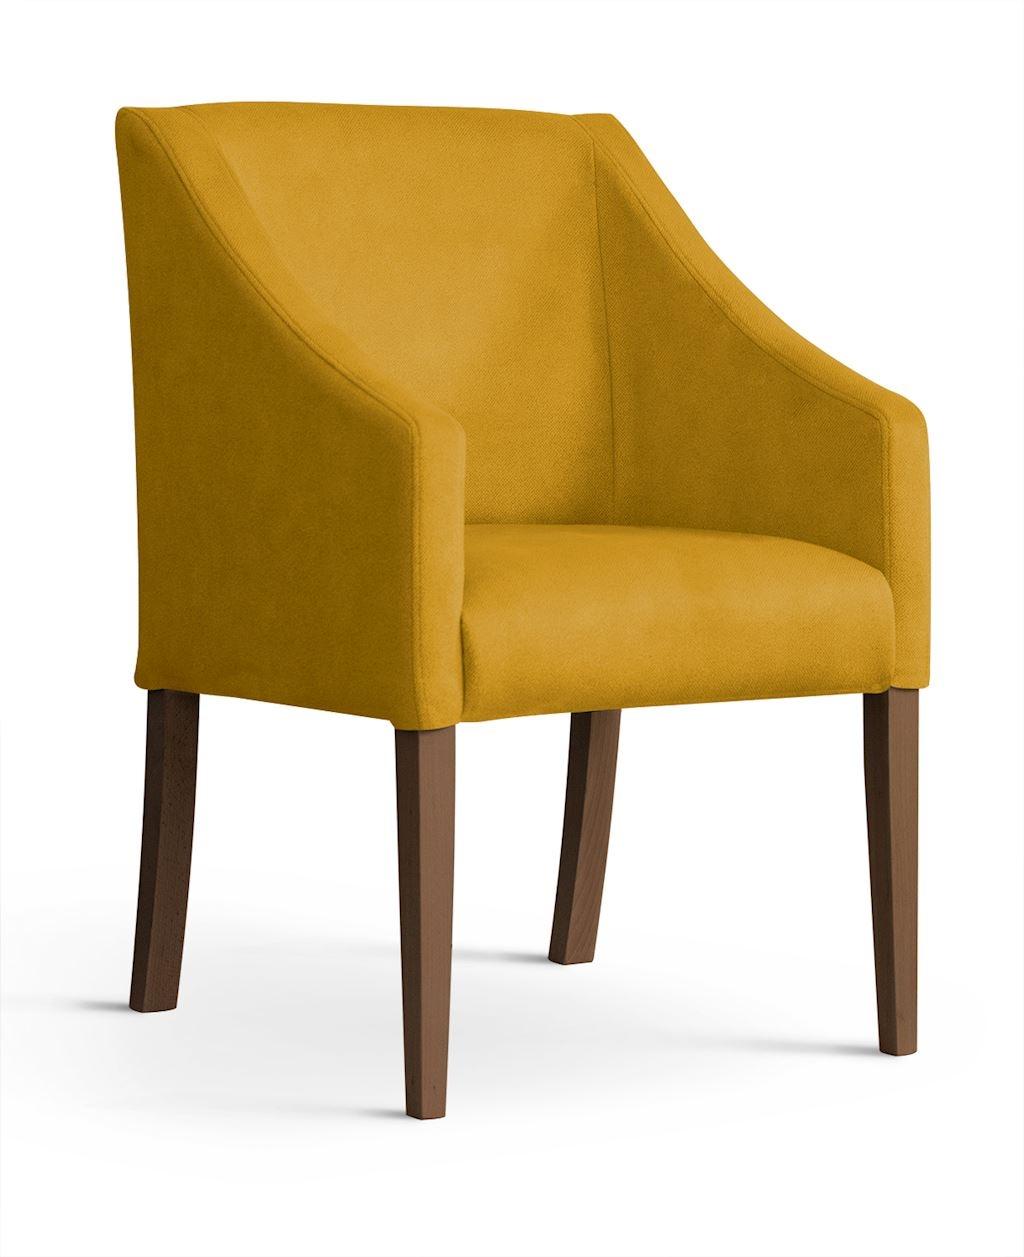 Fotoliu fix tapitat cu stofa, cu picioare din lemn Capri Honey / Walnut, l58xA60xH89 cm